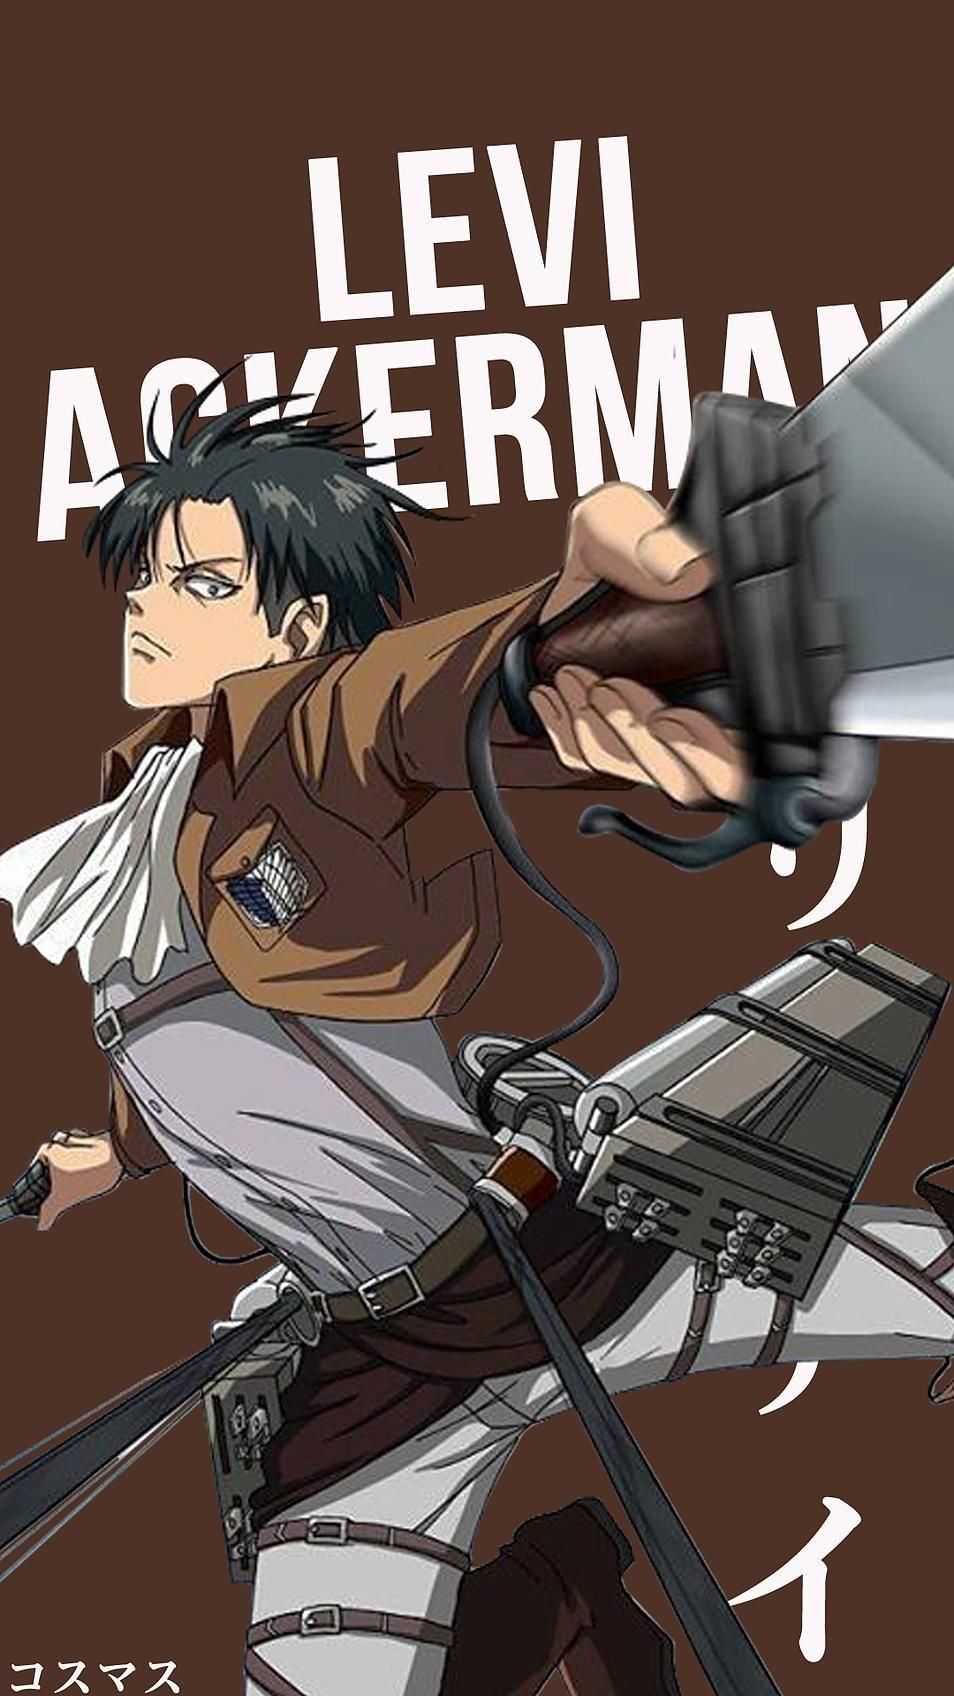 Levi Ackerman V1 Korigengi Anime Wallpaper Hd Source Attack On Titan Levi Anime Attack On Titan